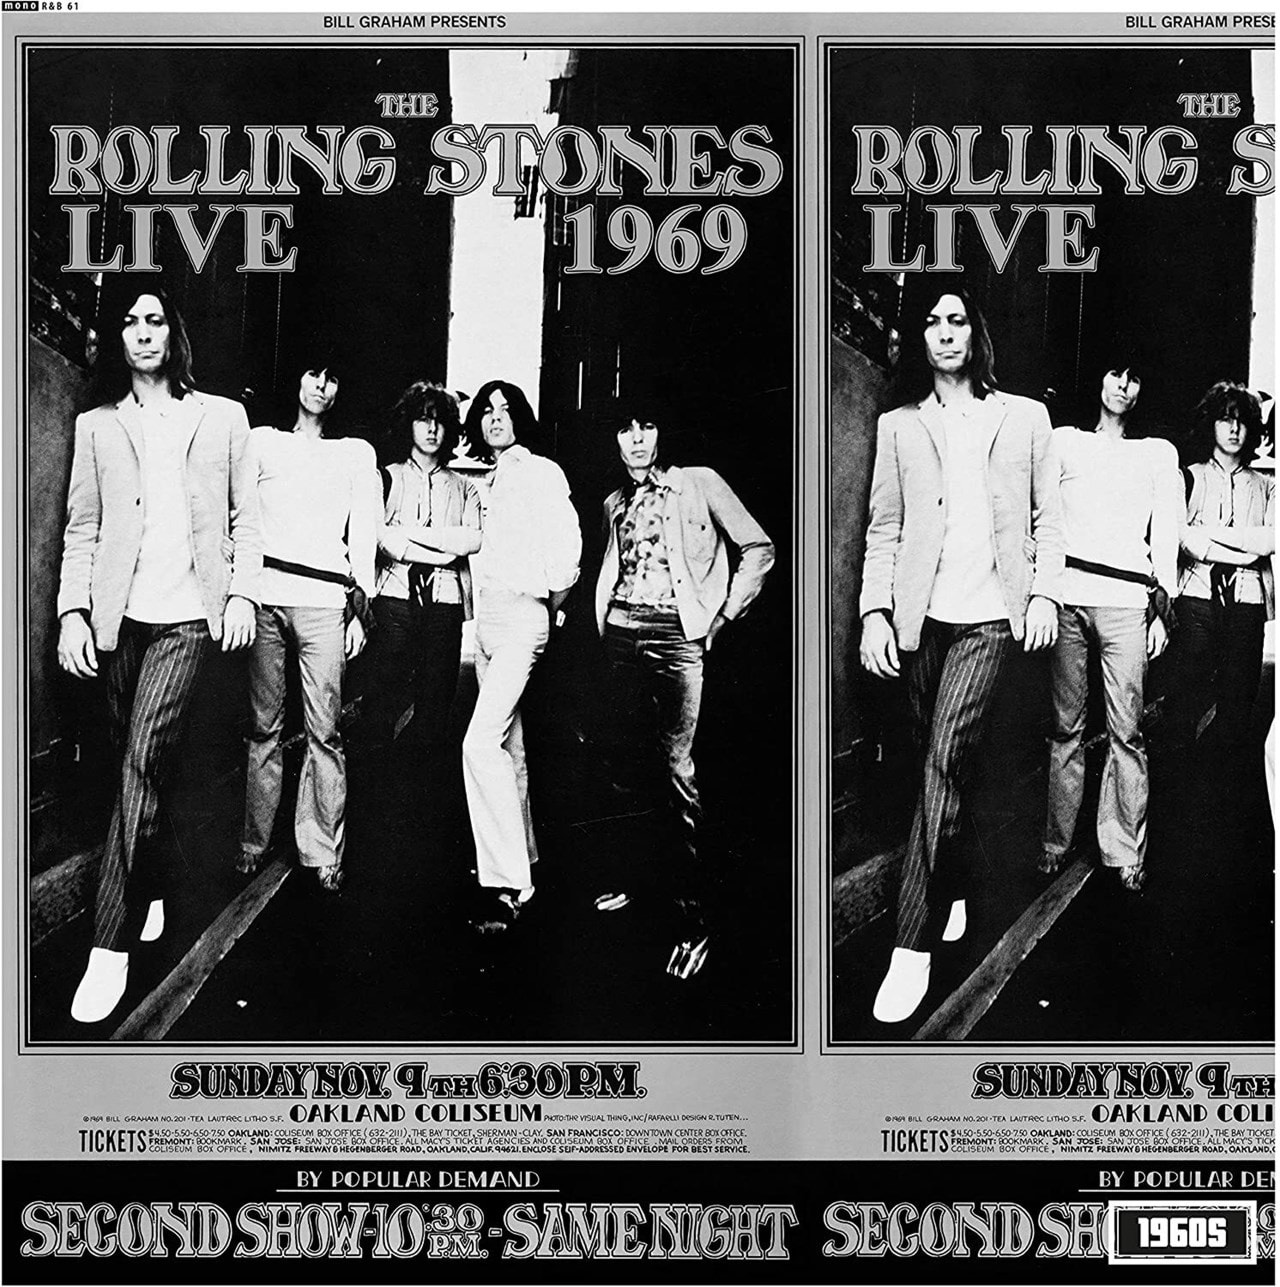 Live at the Oakland Coliseum 1969 - 1